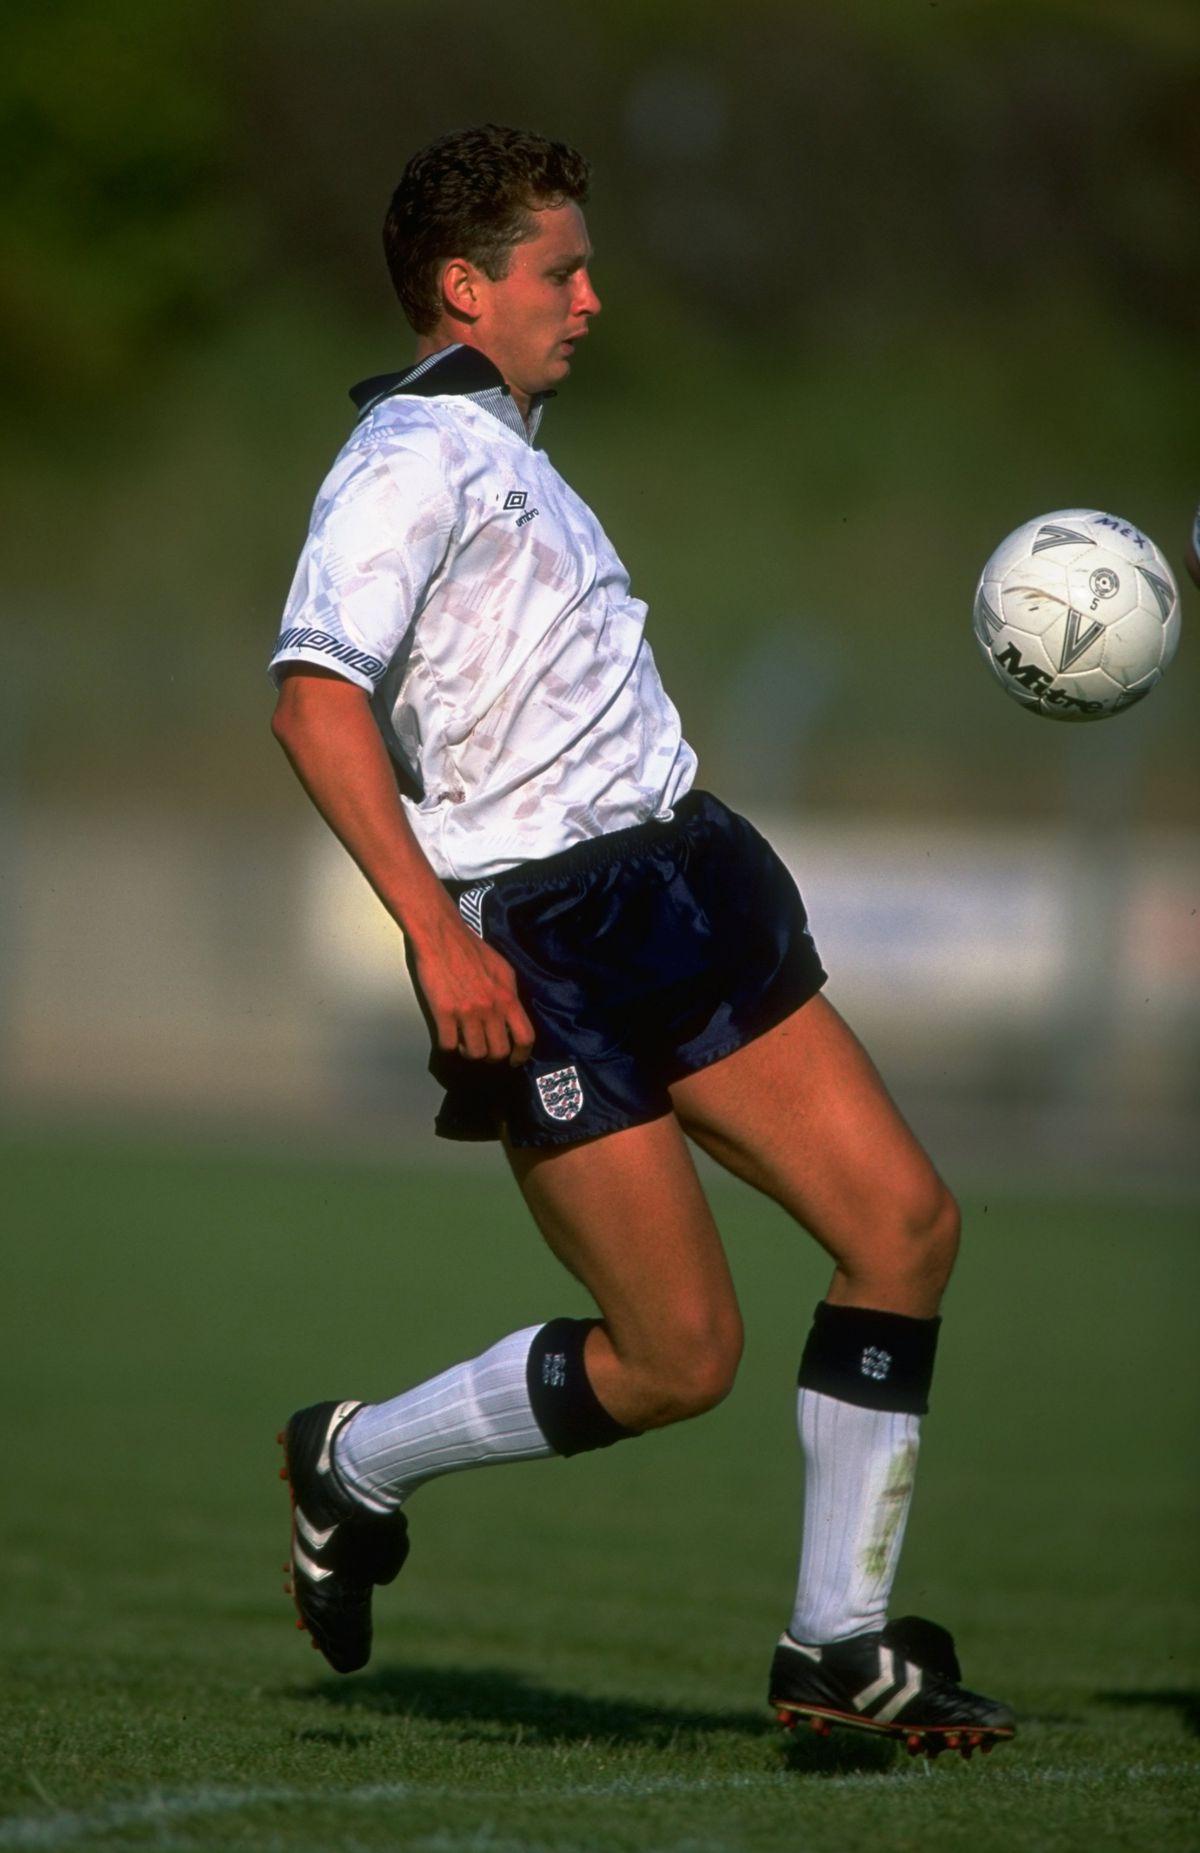 Brian Atkinson of England